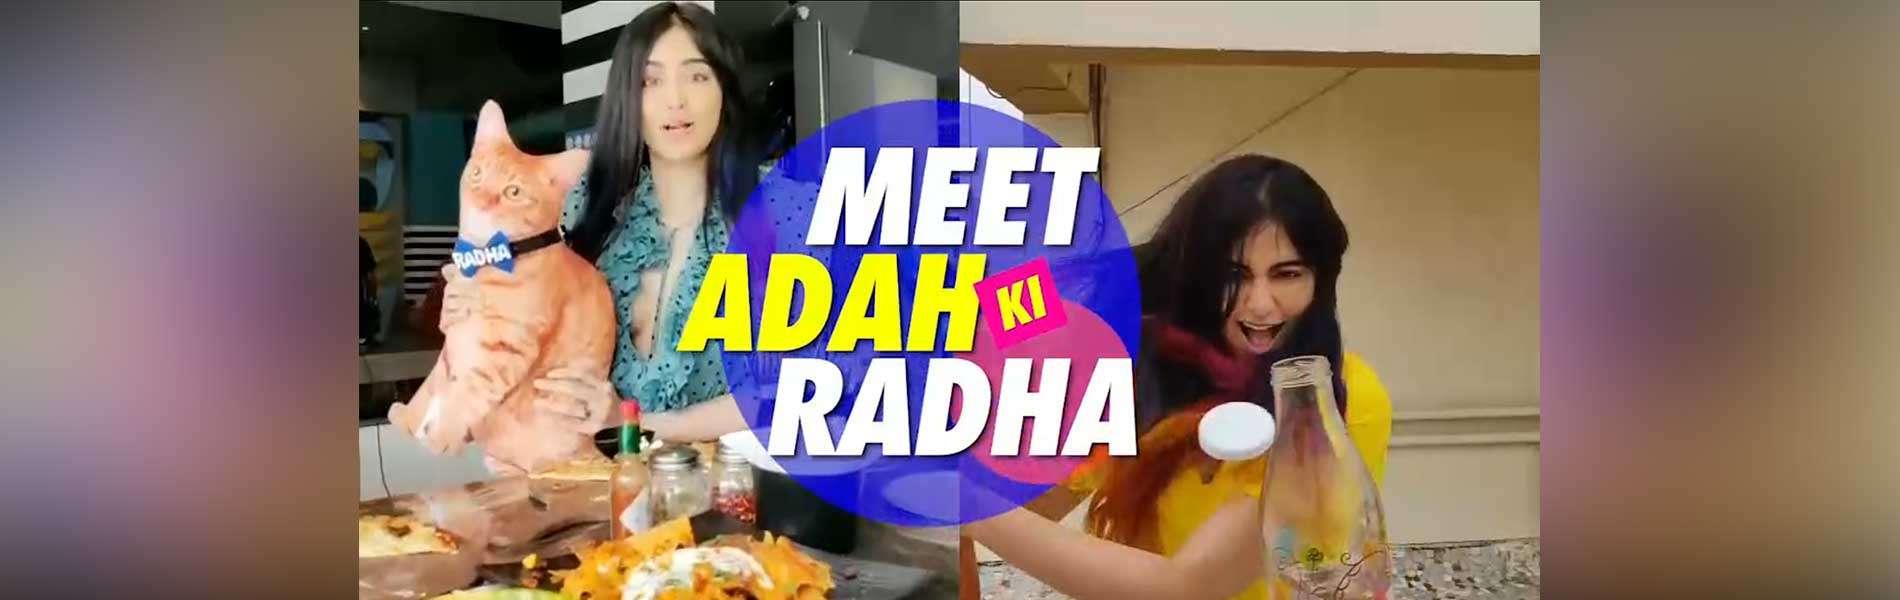 exclusive-adah-sharma-introduces-radha-calls-her-a-budding-starkid